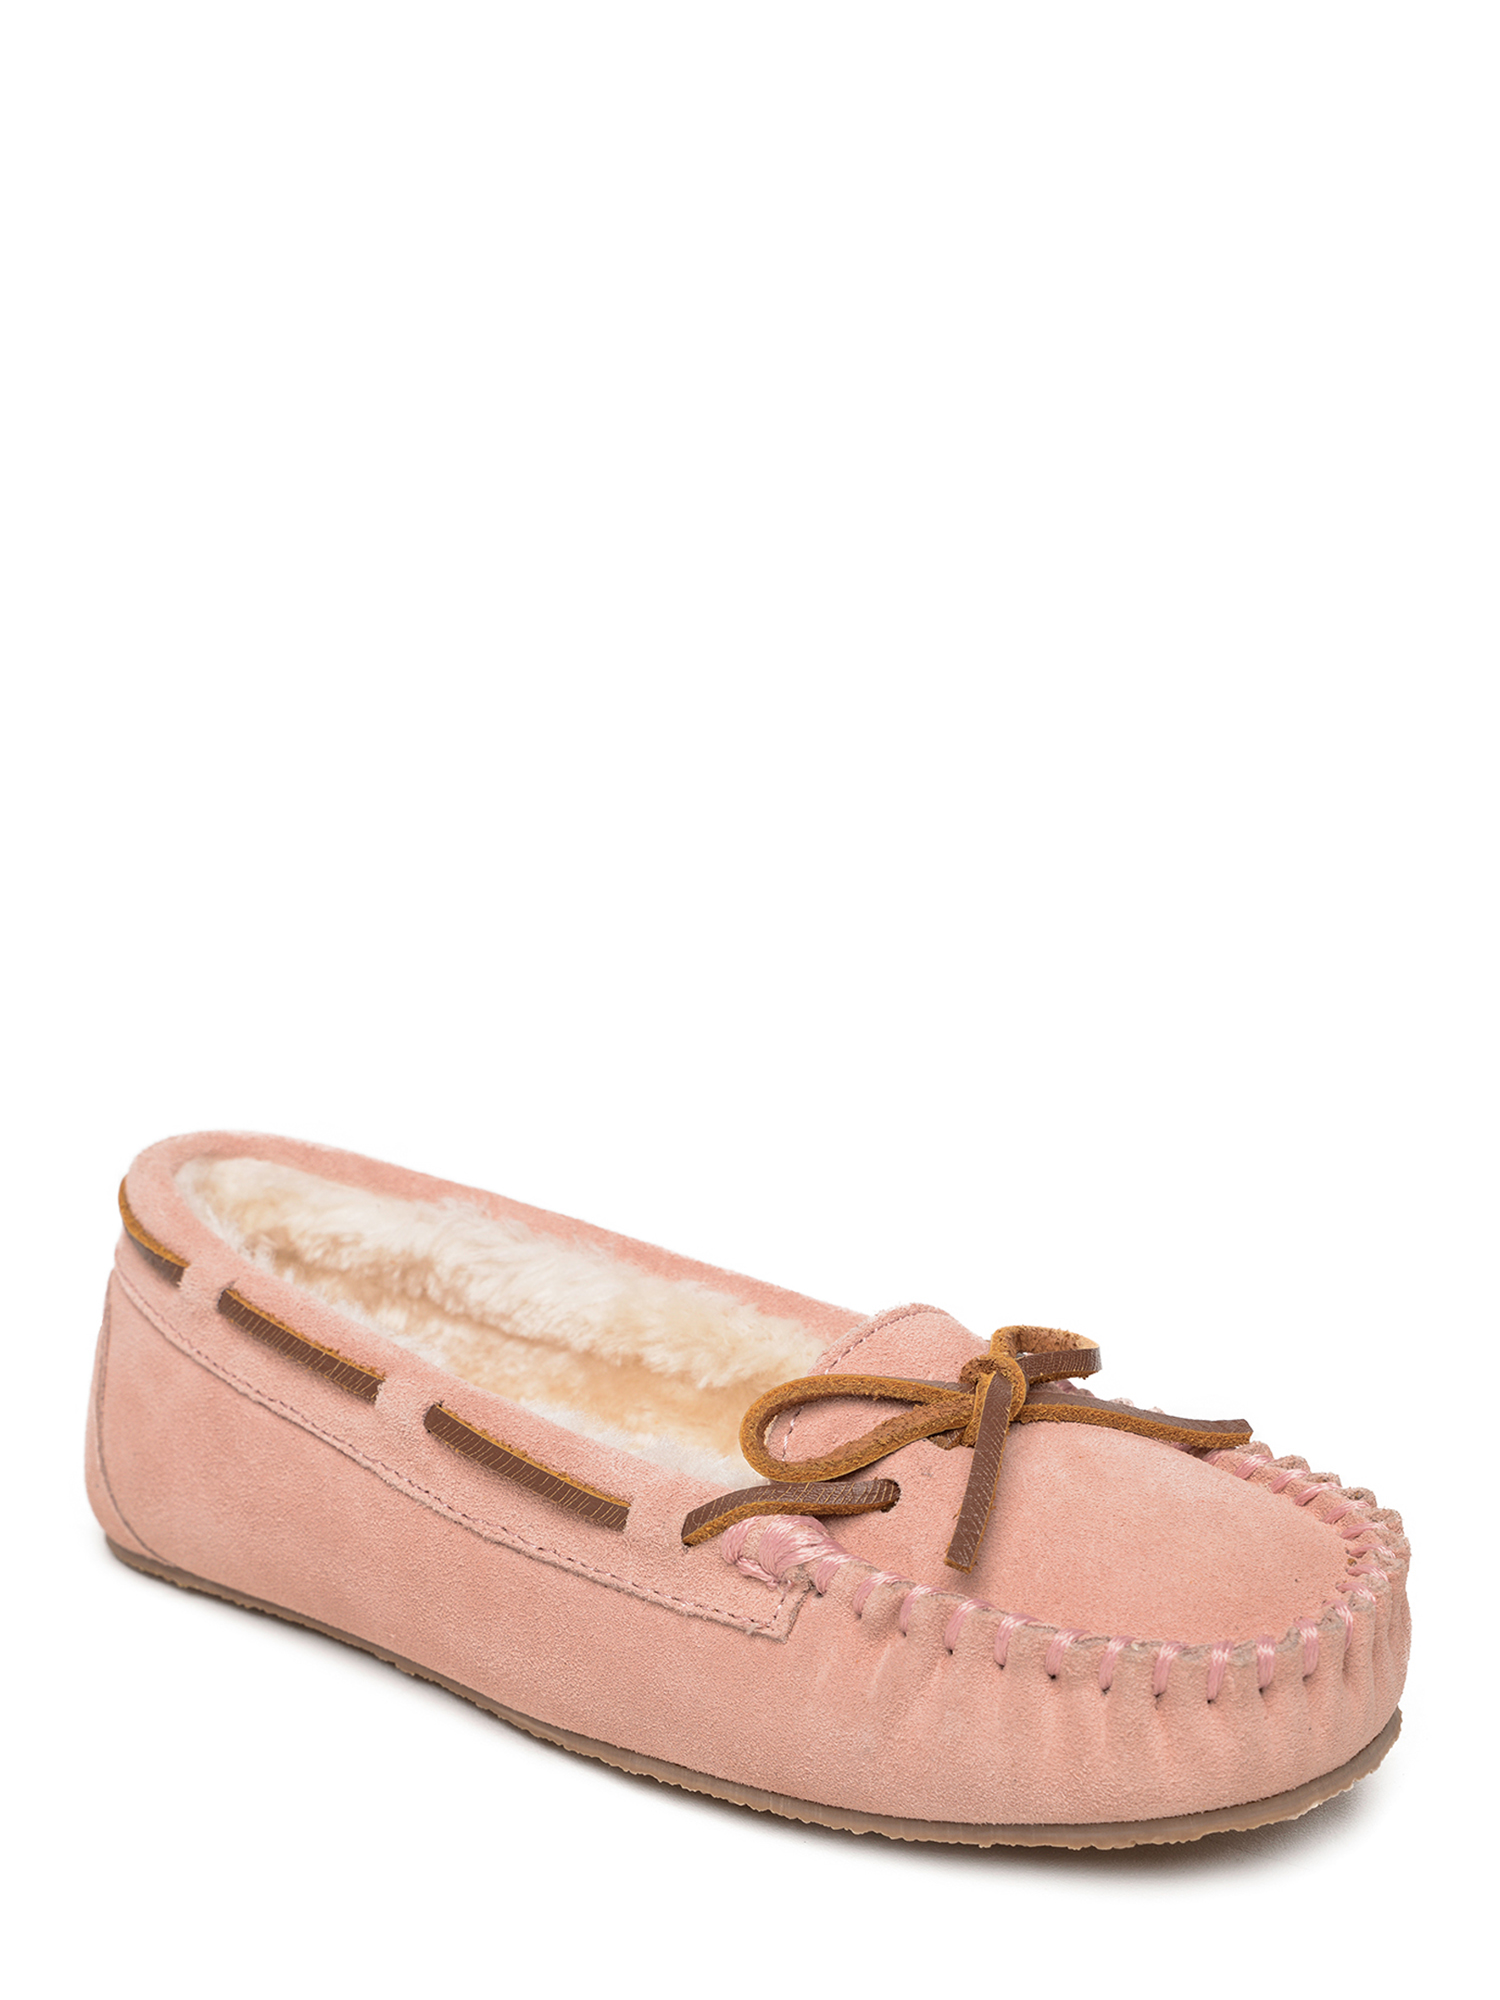 Pink Womens Slippers - Walmart.com